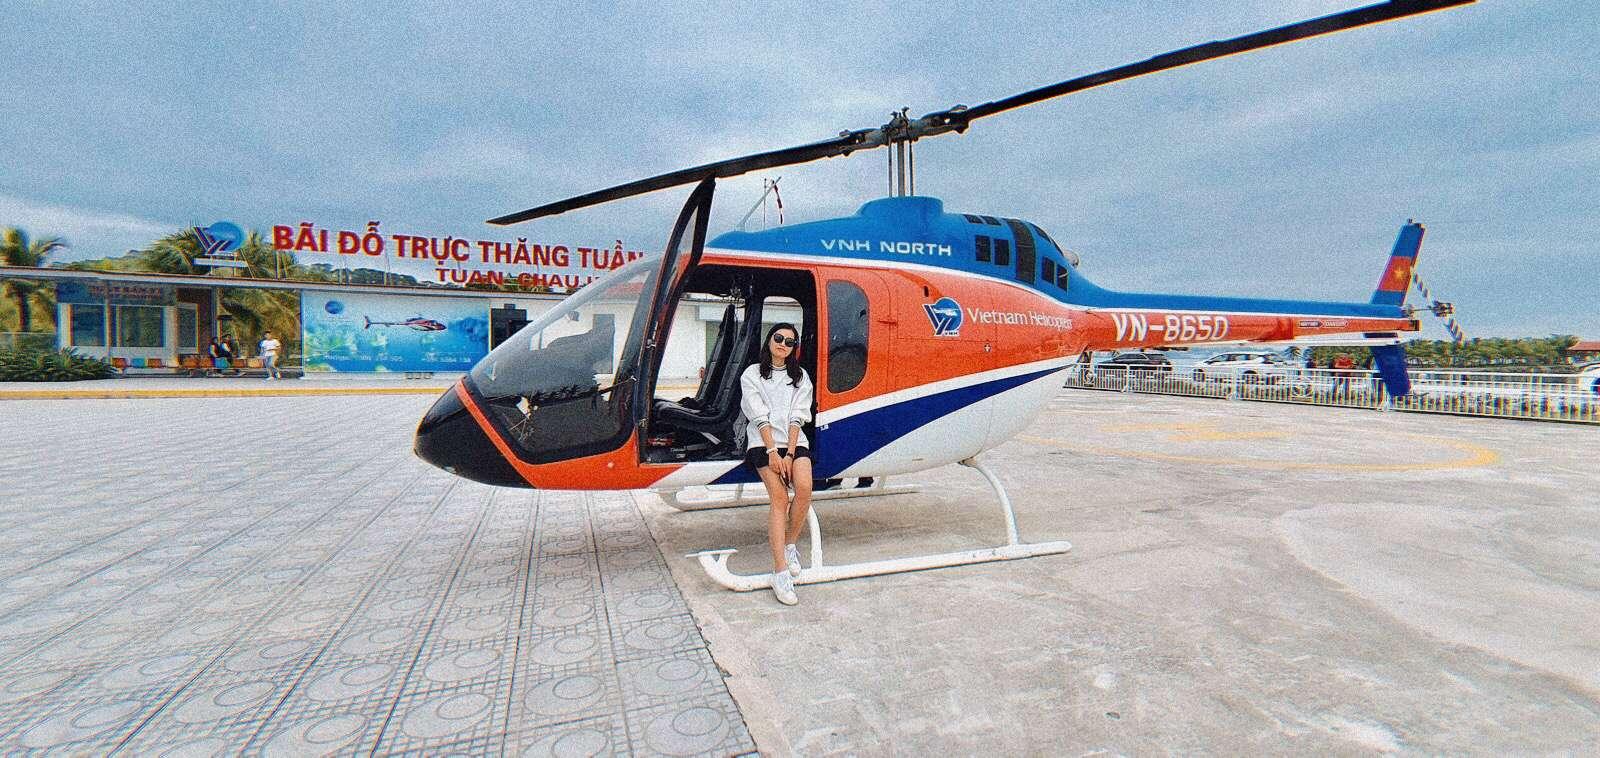 https://gody.vn/blog/hazeline956496/post/review-tuong-ko-de-ma-de-ko-tuong-ngam-vinh-ha-long-bang-truc-thang-8825